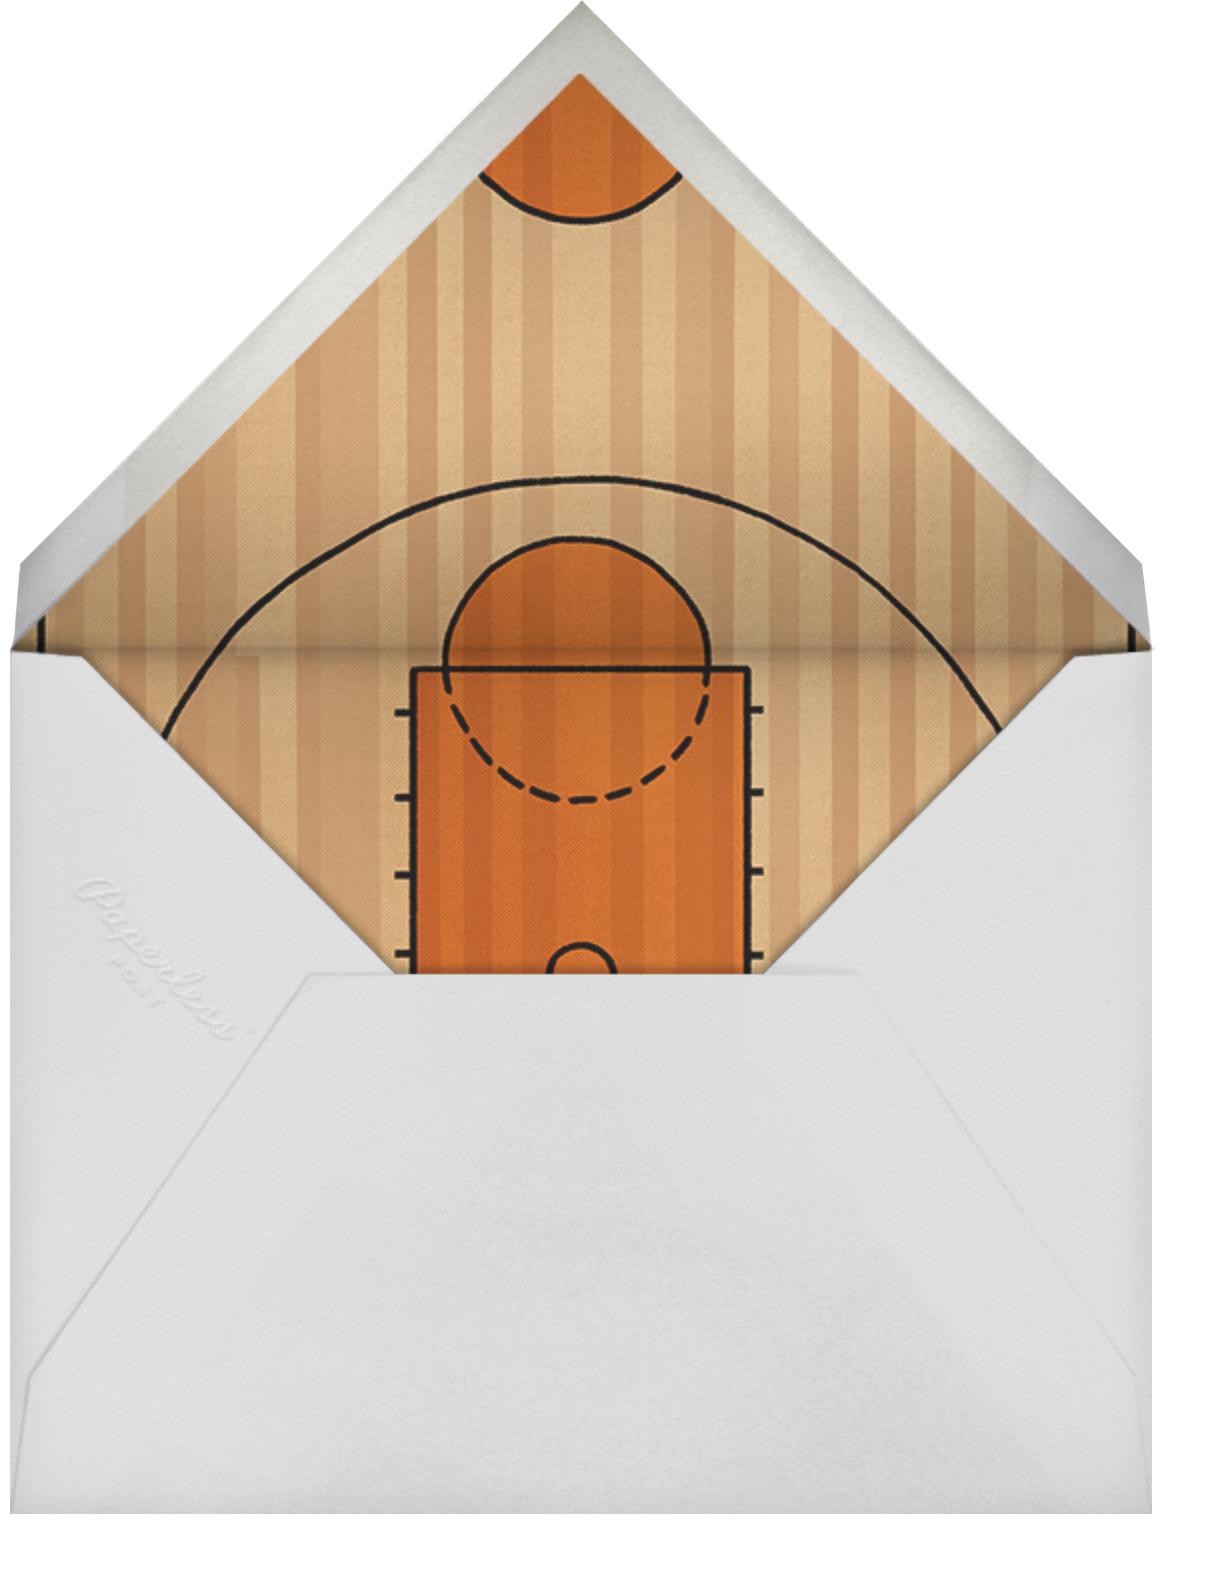 Courtside Seats - Basketball - Paperless Post - Sports - envelope back